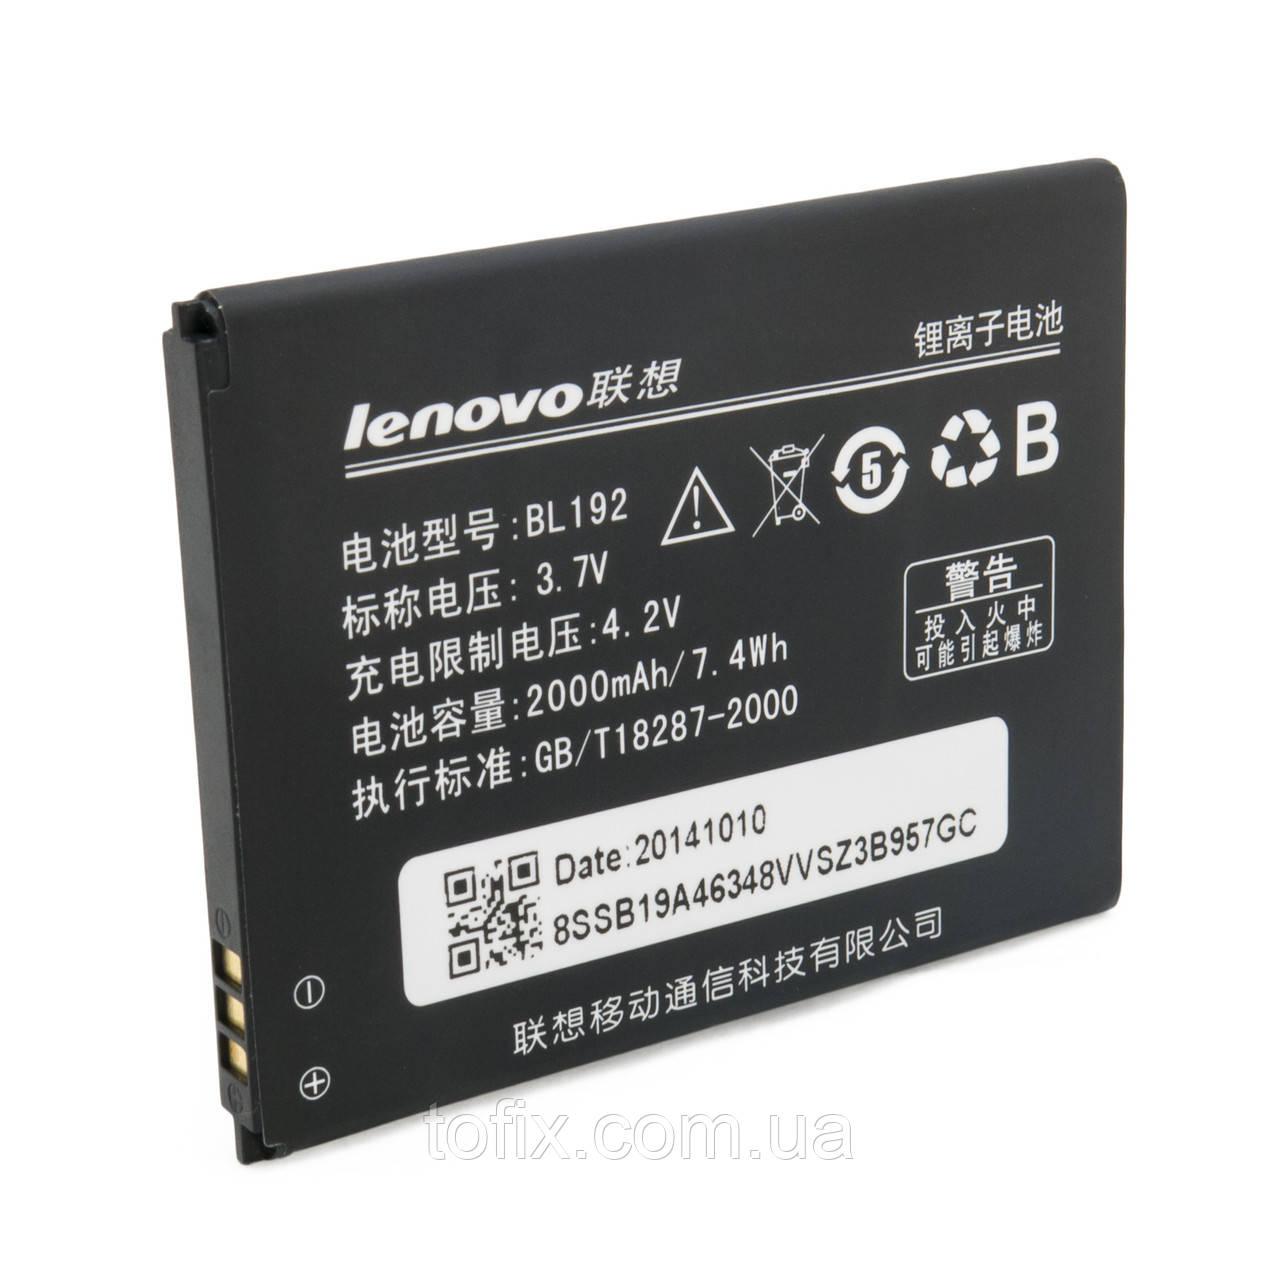 Батарея (акб, аккумулятор) BL192 для Lenovo A529 IdeaPhone, 2000 mAh, оригинал